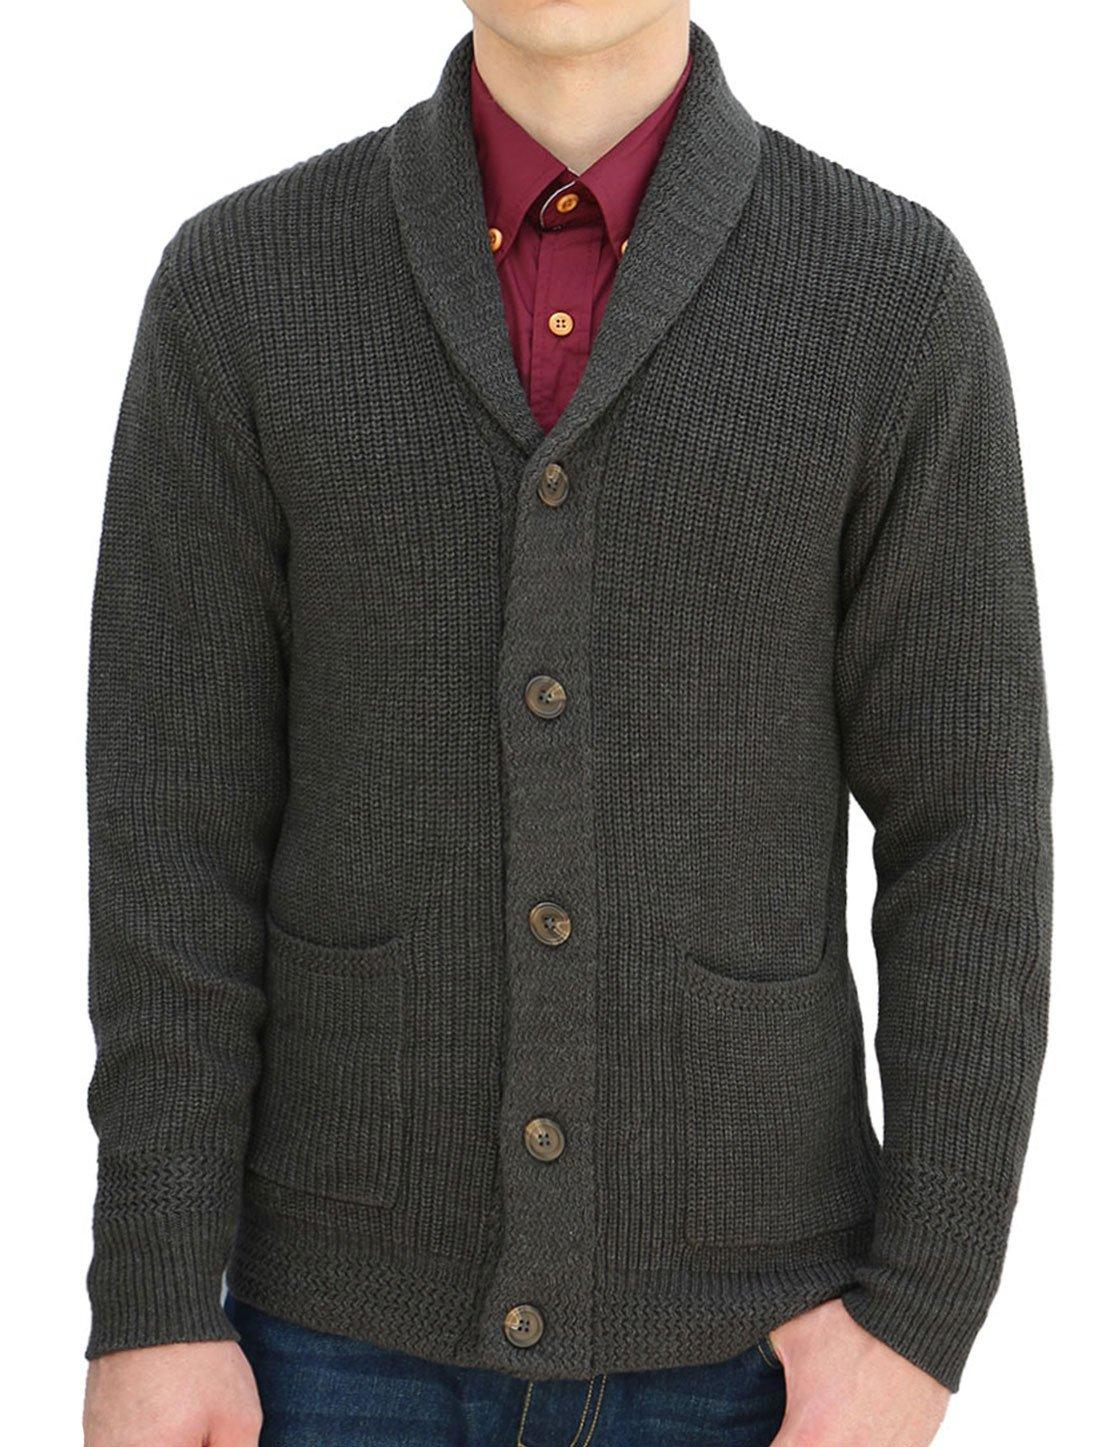 Allegra K Men Shawl Collar Pockets Front Button Front Cardigan M Black,Black,Medium / US 40